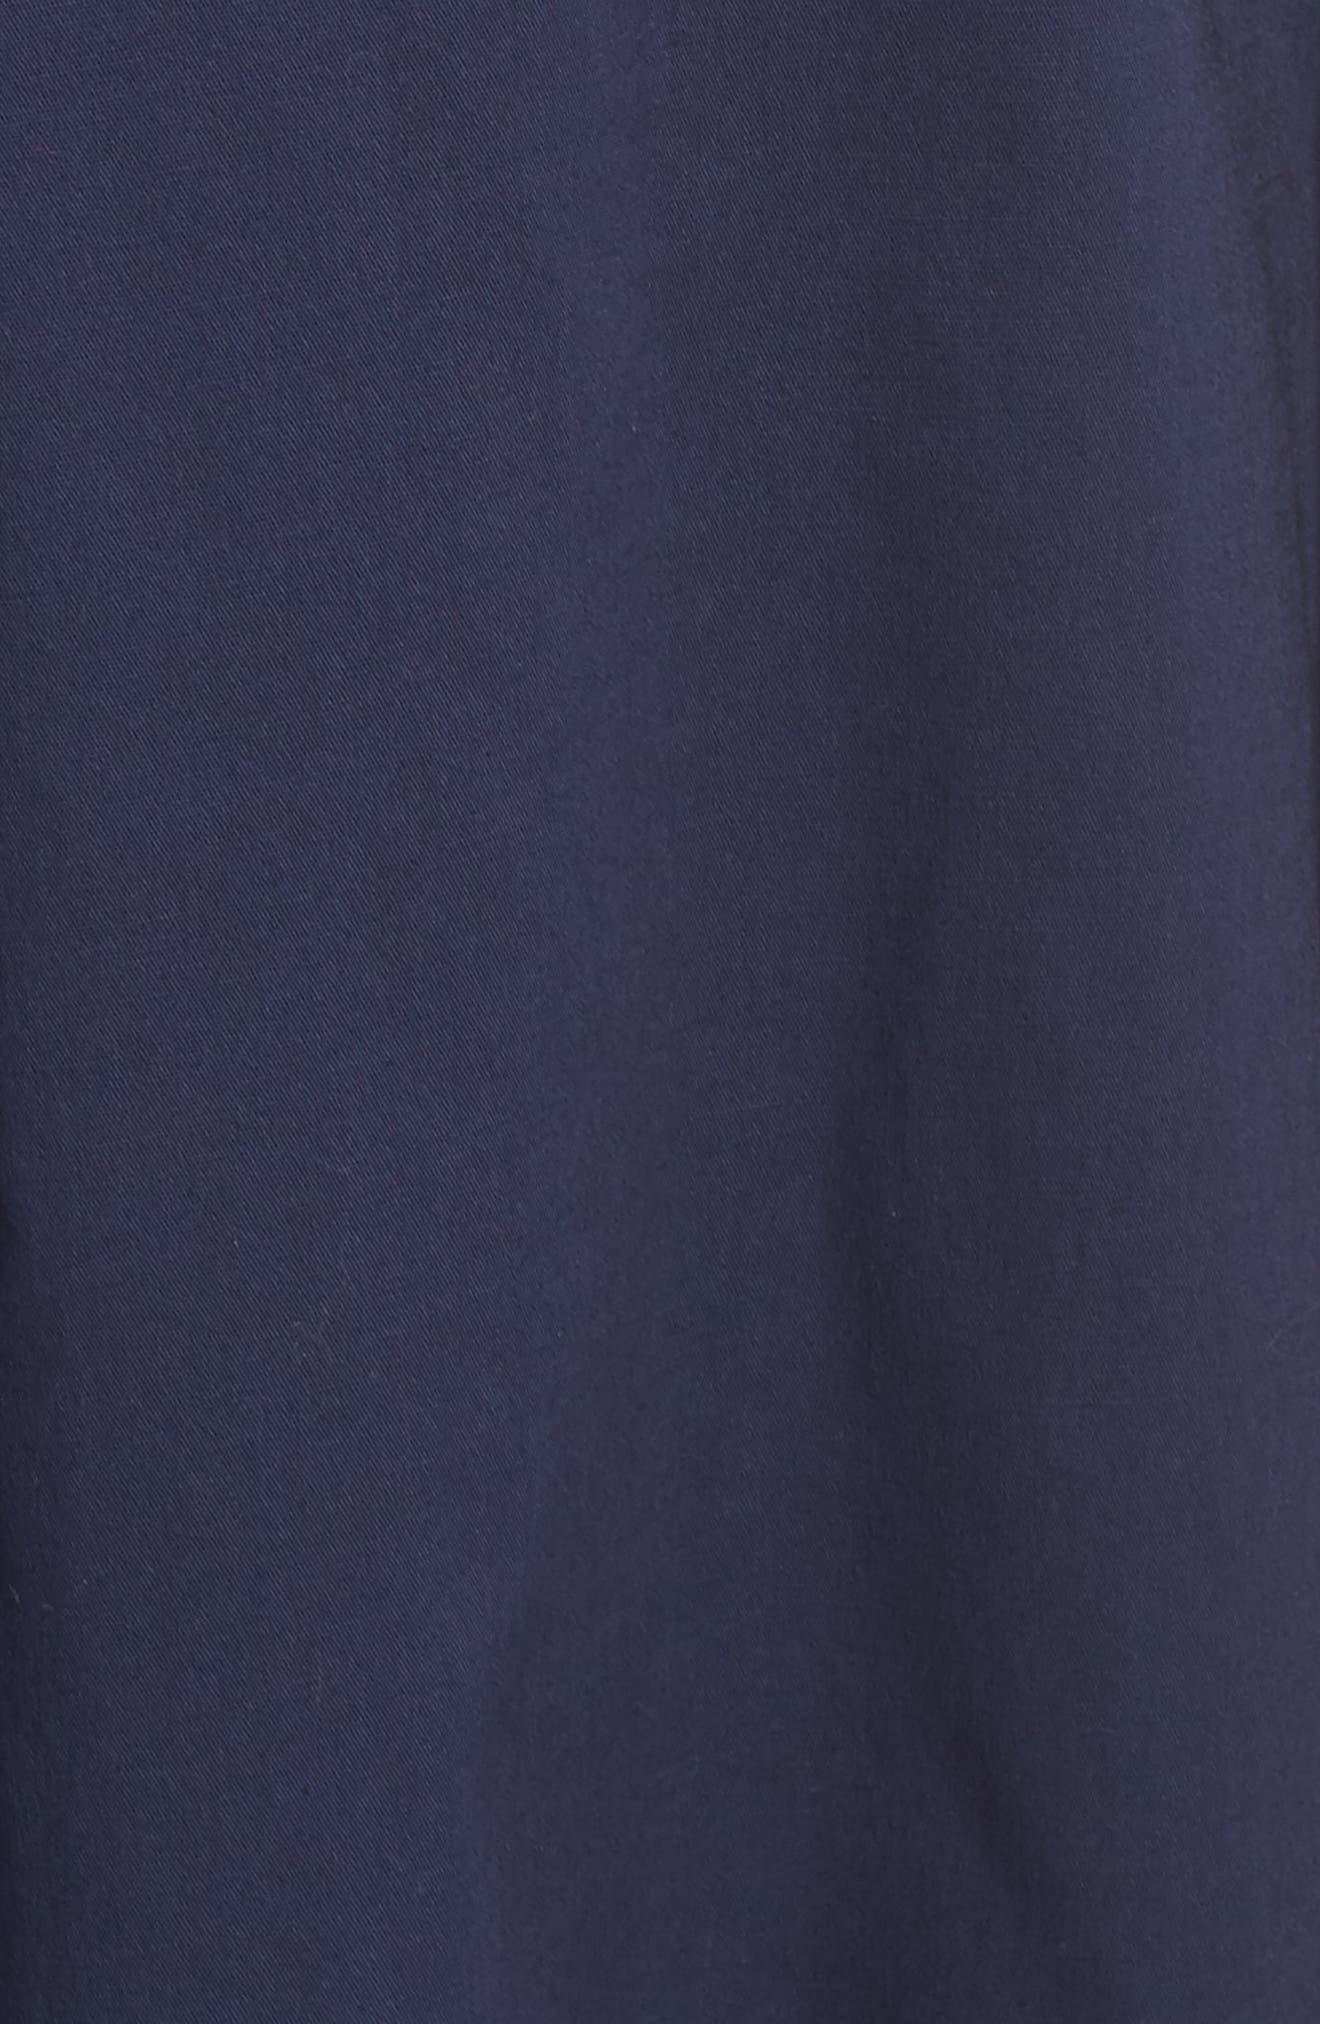 Rose Sleeveless Cotton Poplin Shirtdress,                             Alternate thumbnail 6, color,                             462